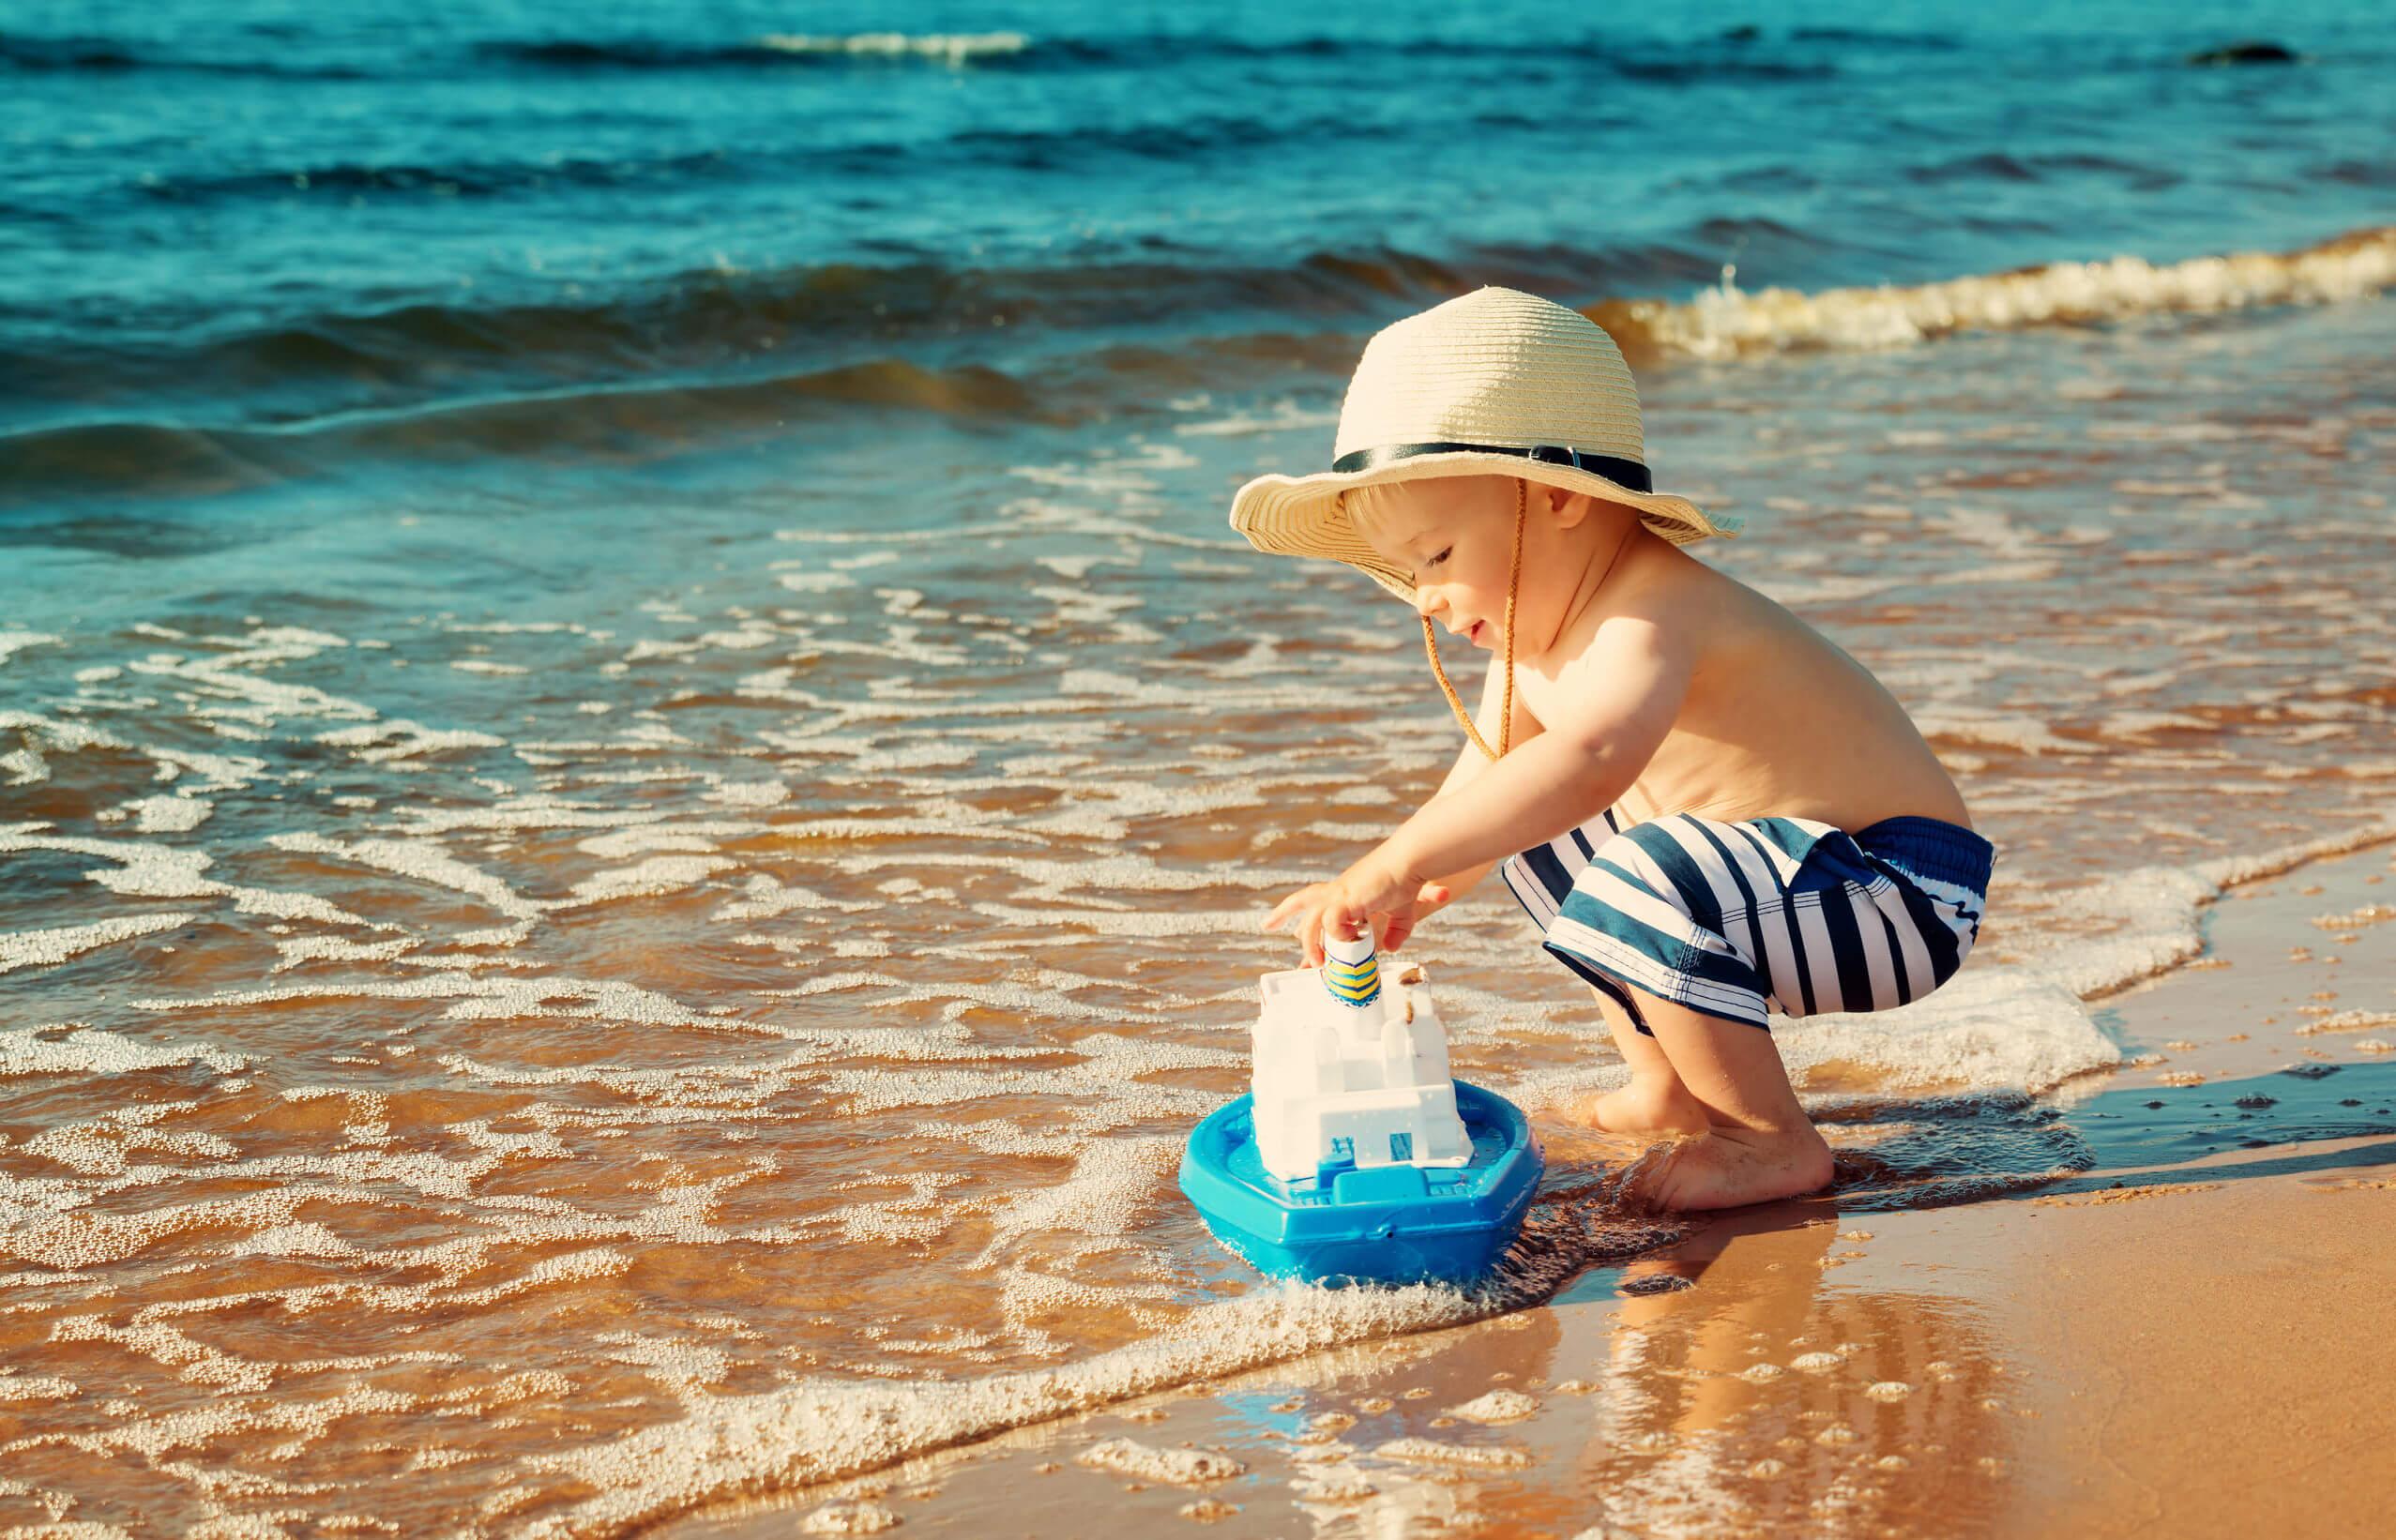 Картинки на море с малышом